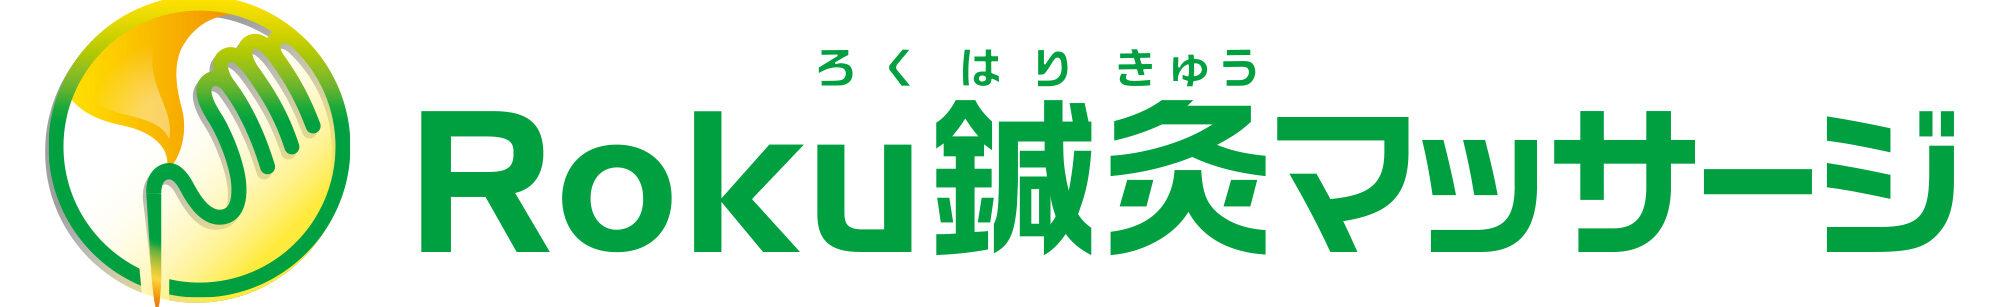 Roku鍼灸マッサージ